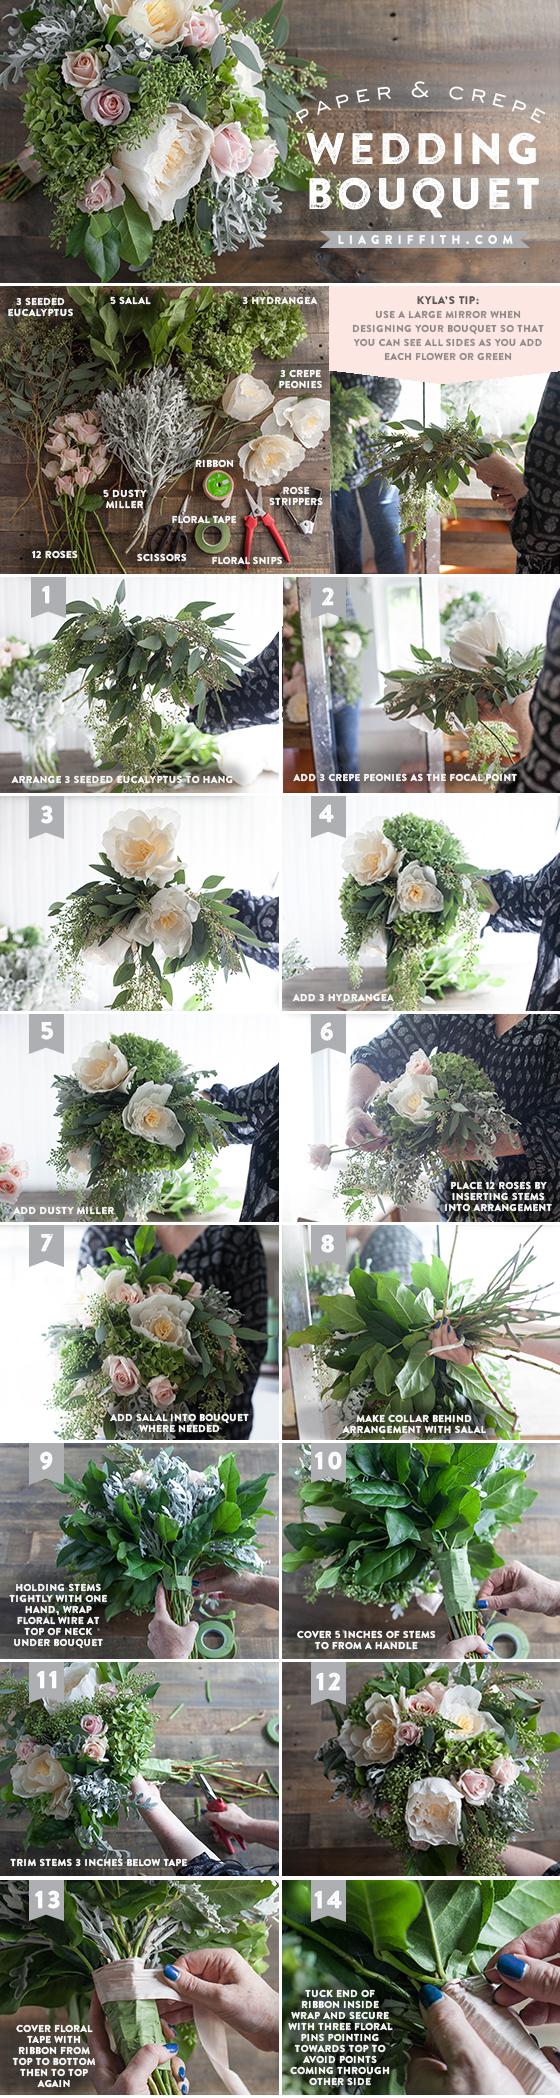 Diy bridal bouquet with fresh and crepe paper flowers diygardenweddingbouquet laurenbridalbouquet jennabridesmaidbouquet bridalbouquettutorial izmirmasajfo